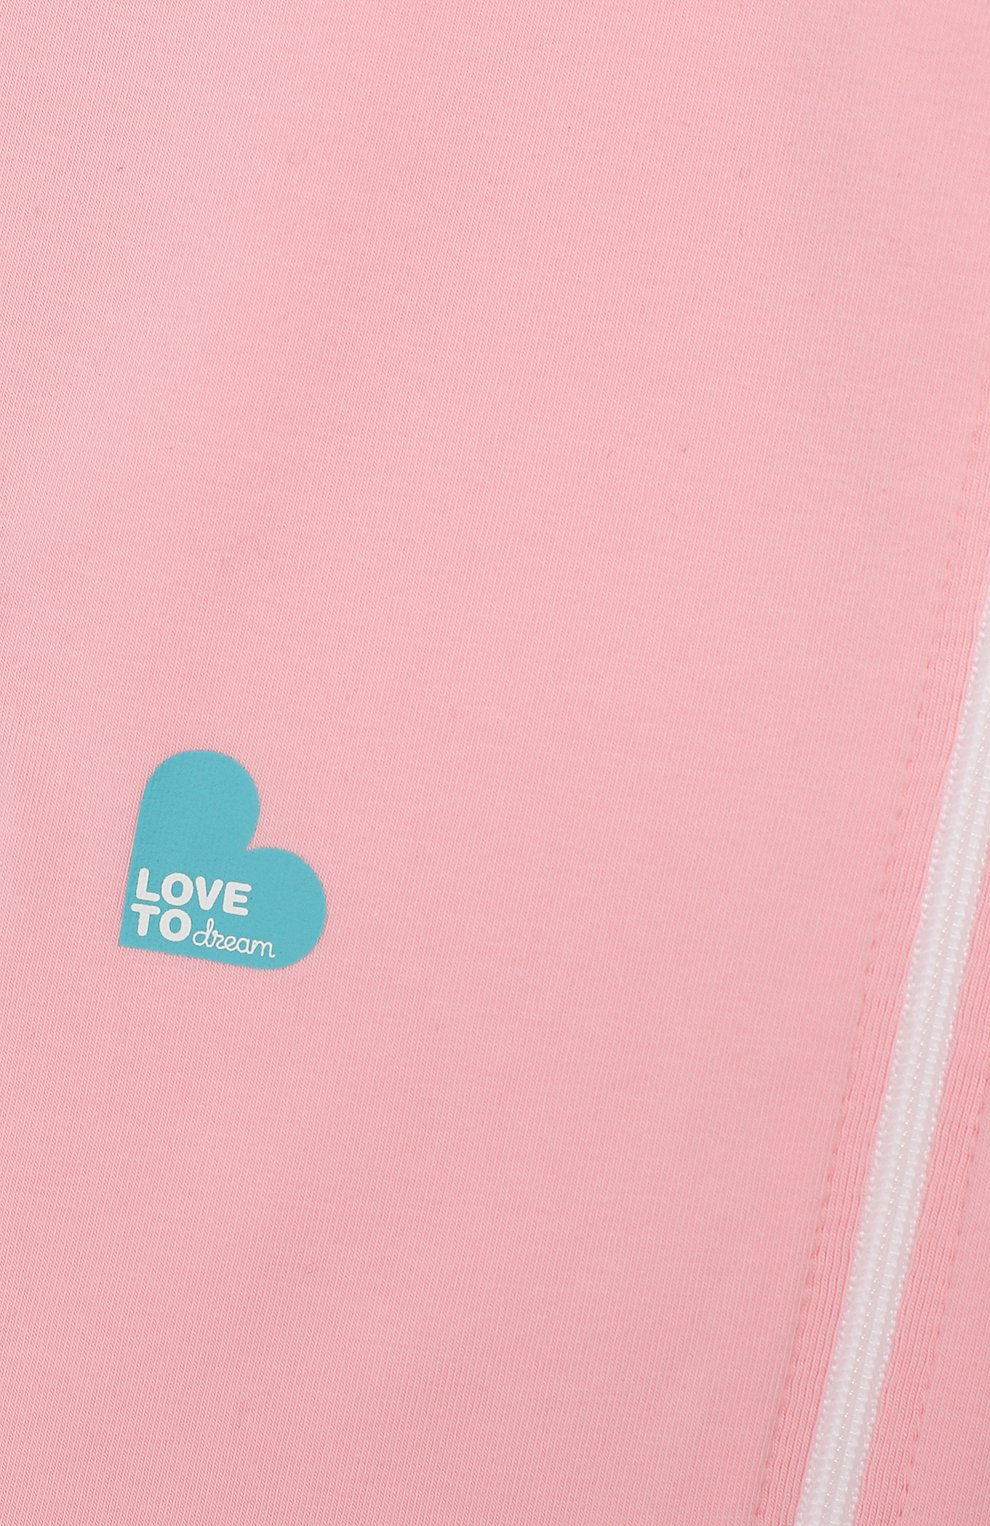 Детский спальный комбинезон LOVE TO DREAM розового цвета, арт. L10 01 001 PK M | Фото 3